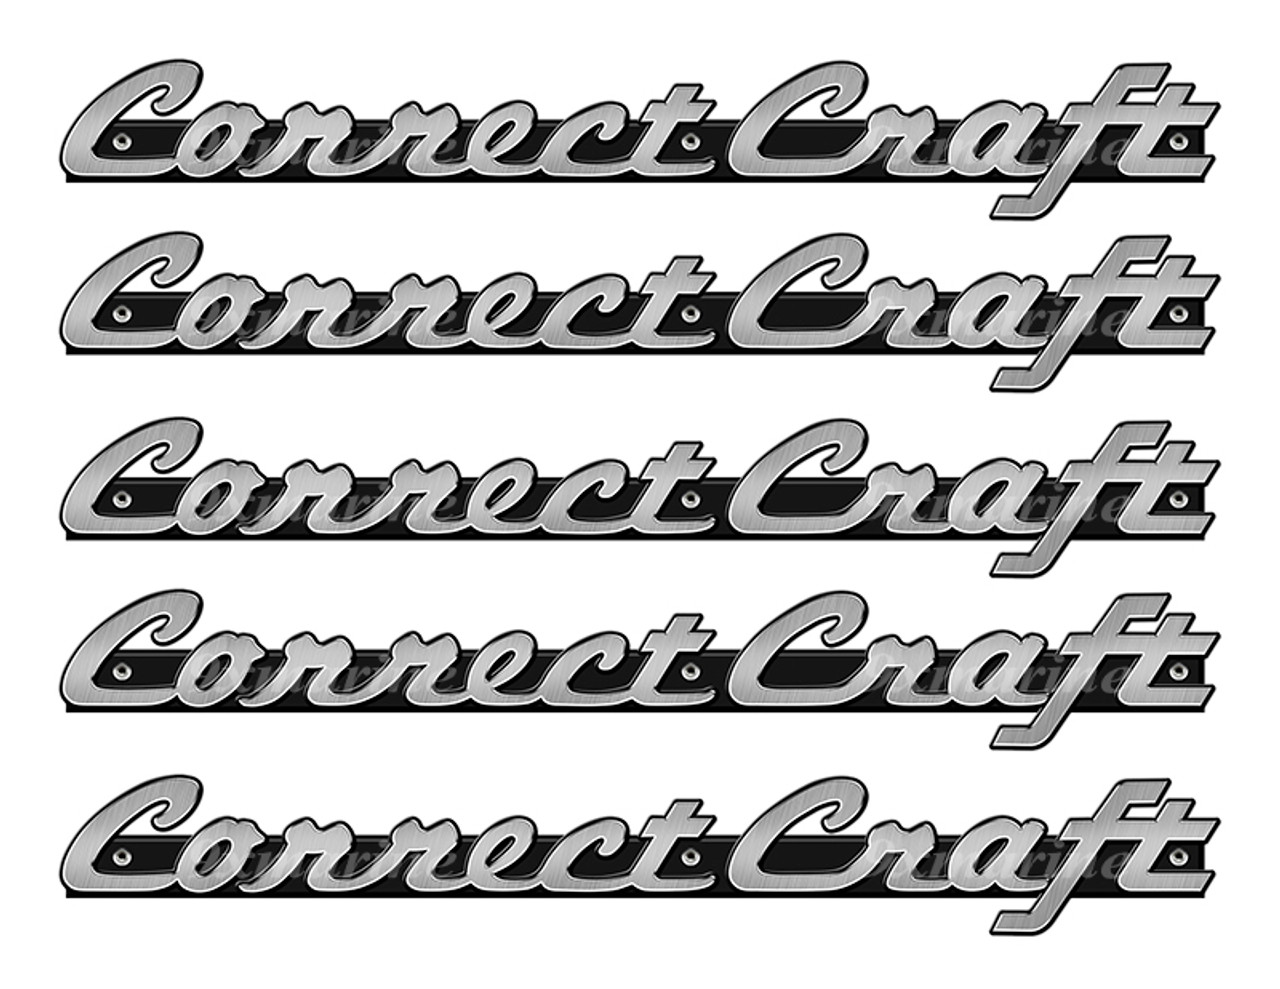 "5 Correct Craft Stickers ""3D Vinyl Replica"" of original - 10"" long"